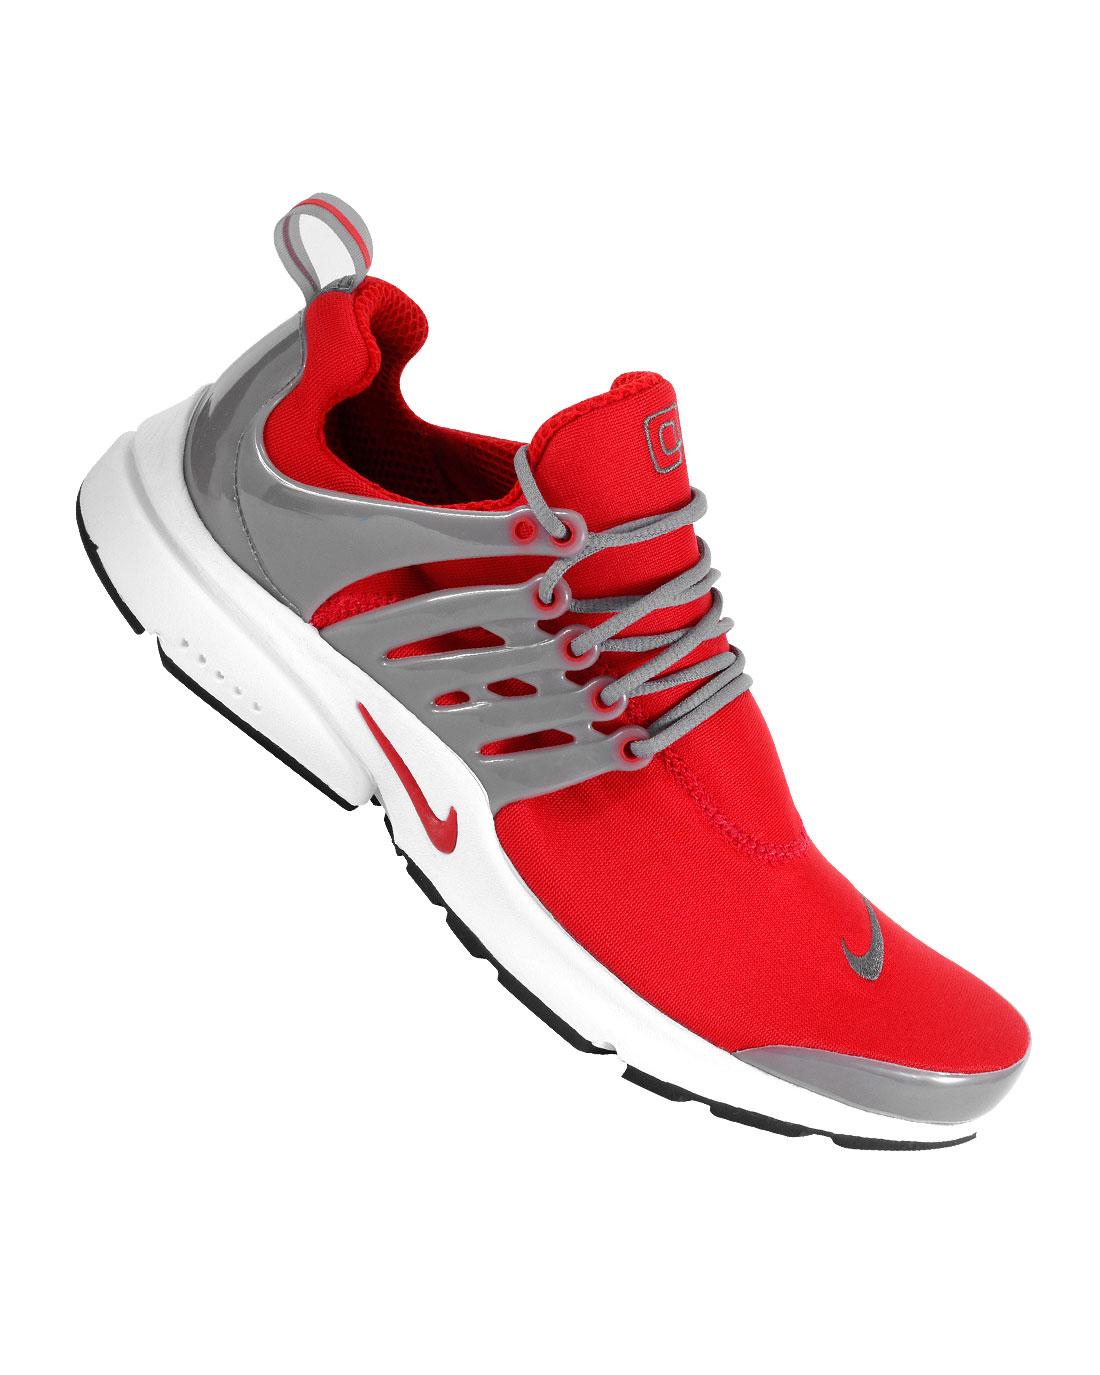 Nike Air Presto - Sport Red Cool Grey-White 8b81c813fe